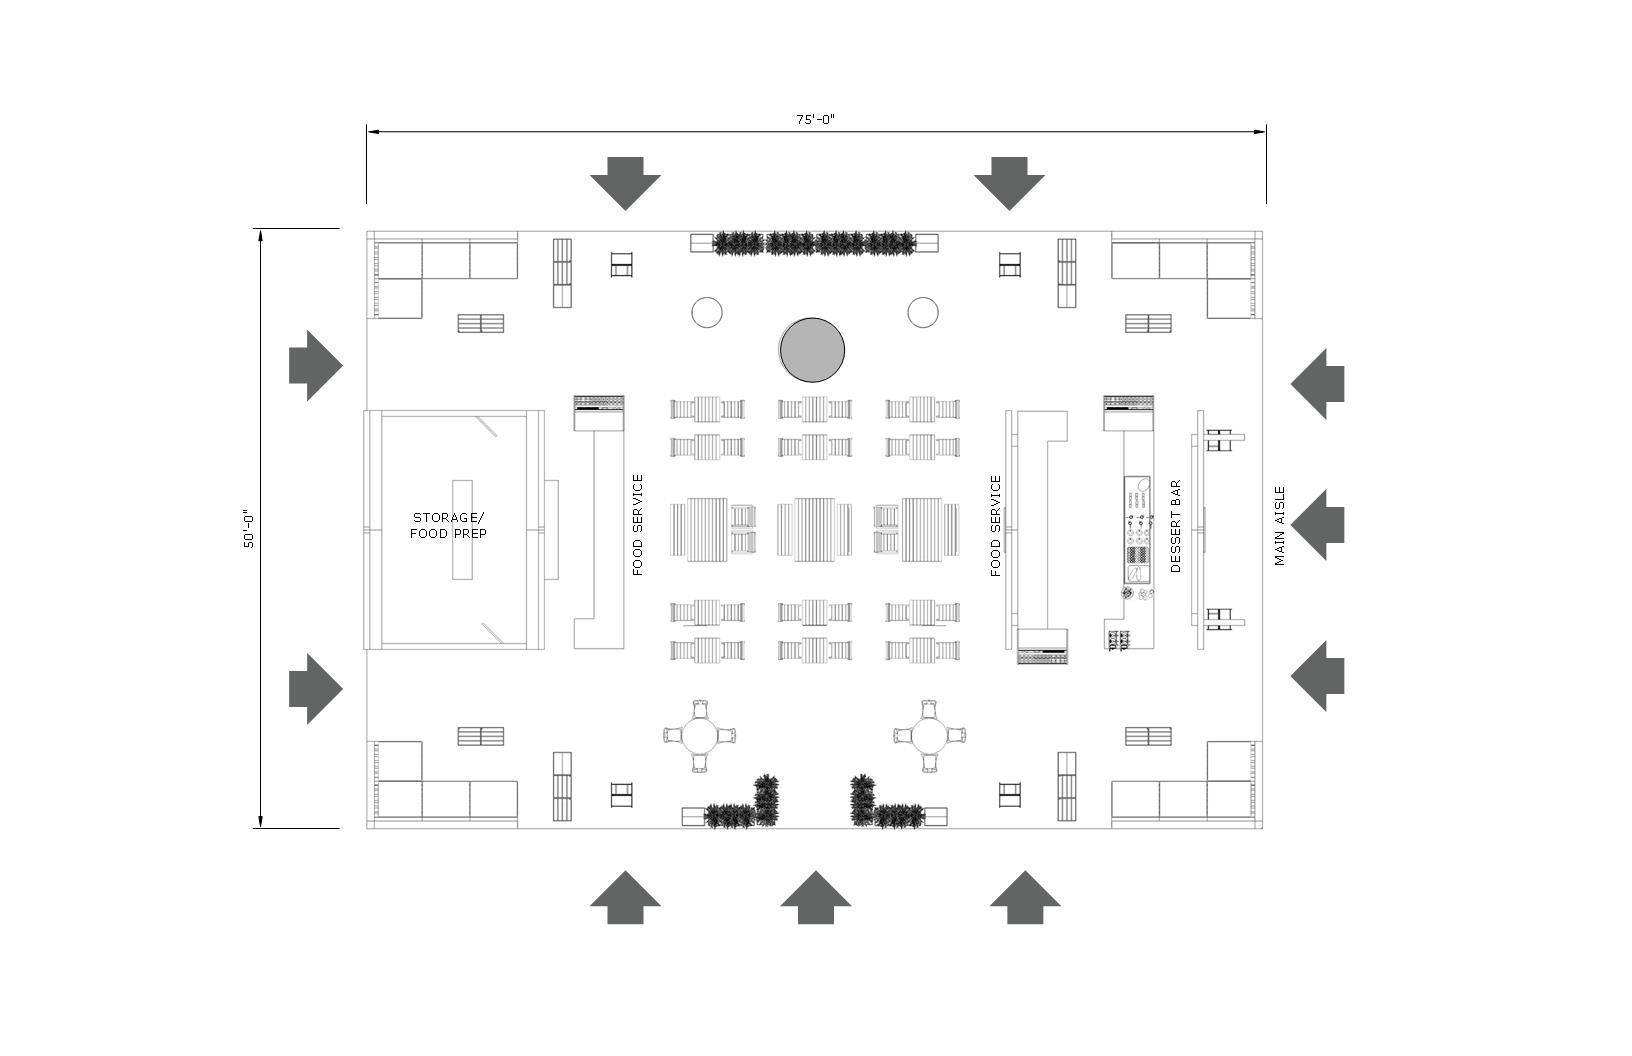 160531_Market_Place_Concept2_Renders_10.jpg